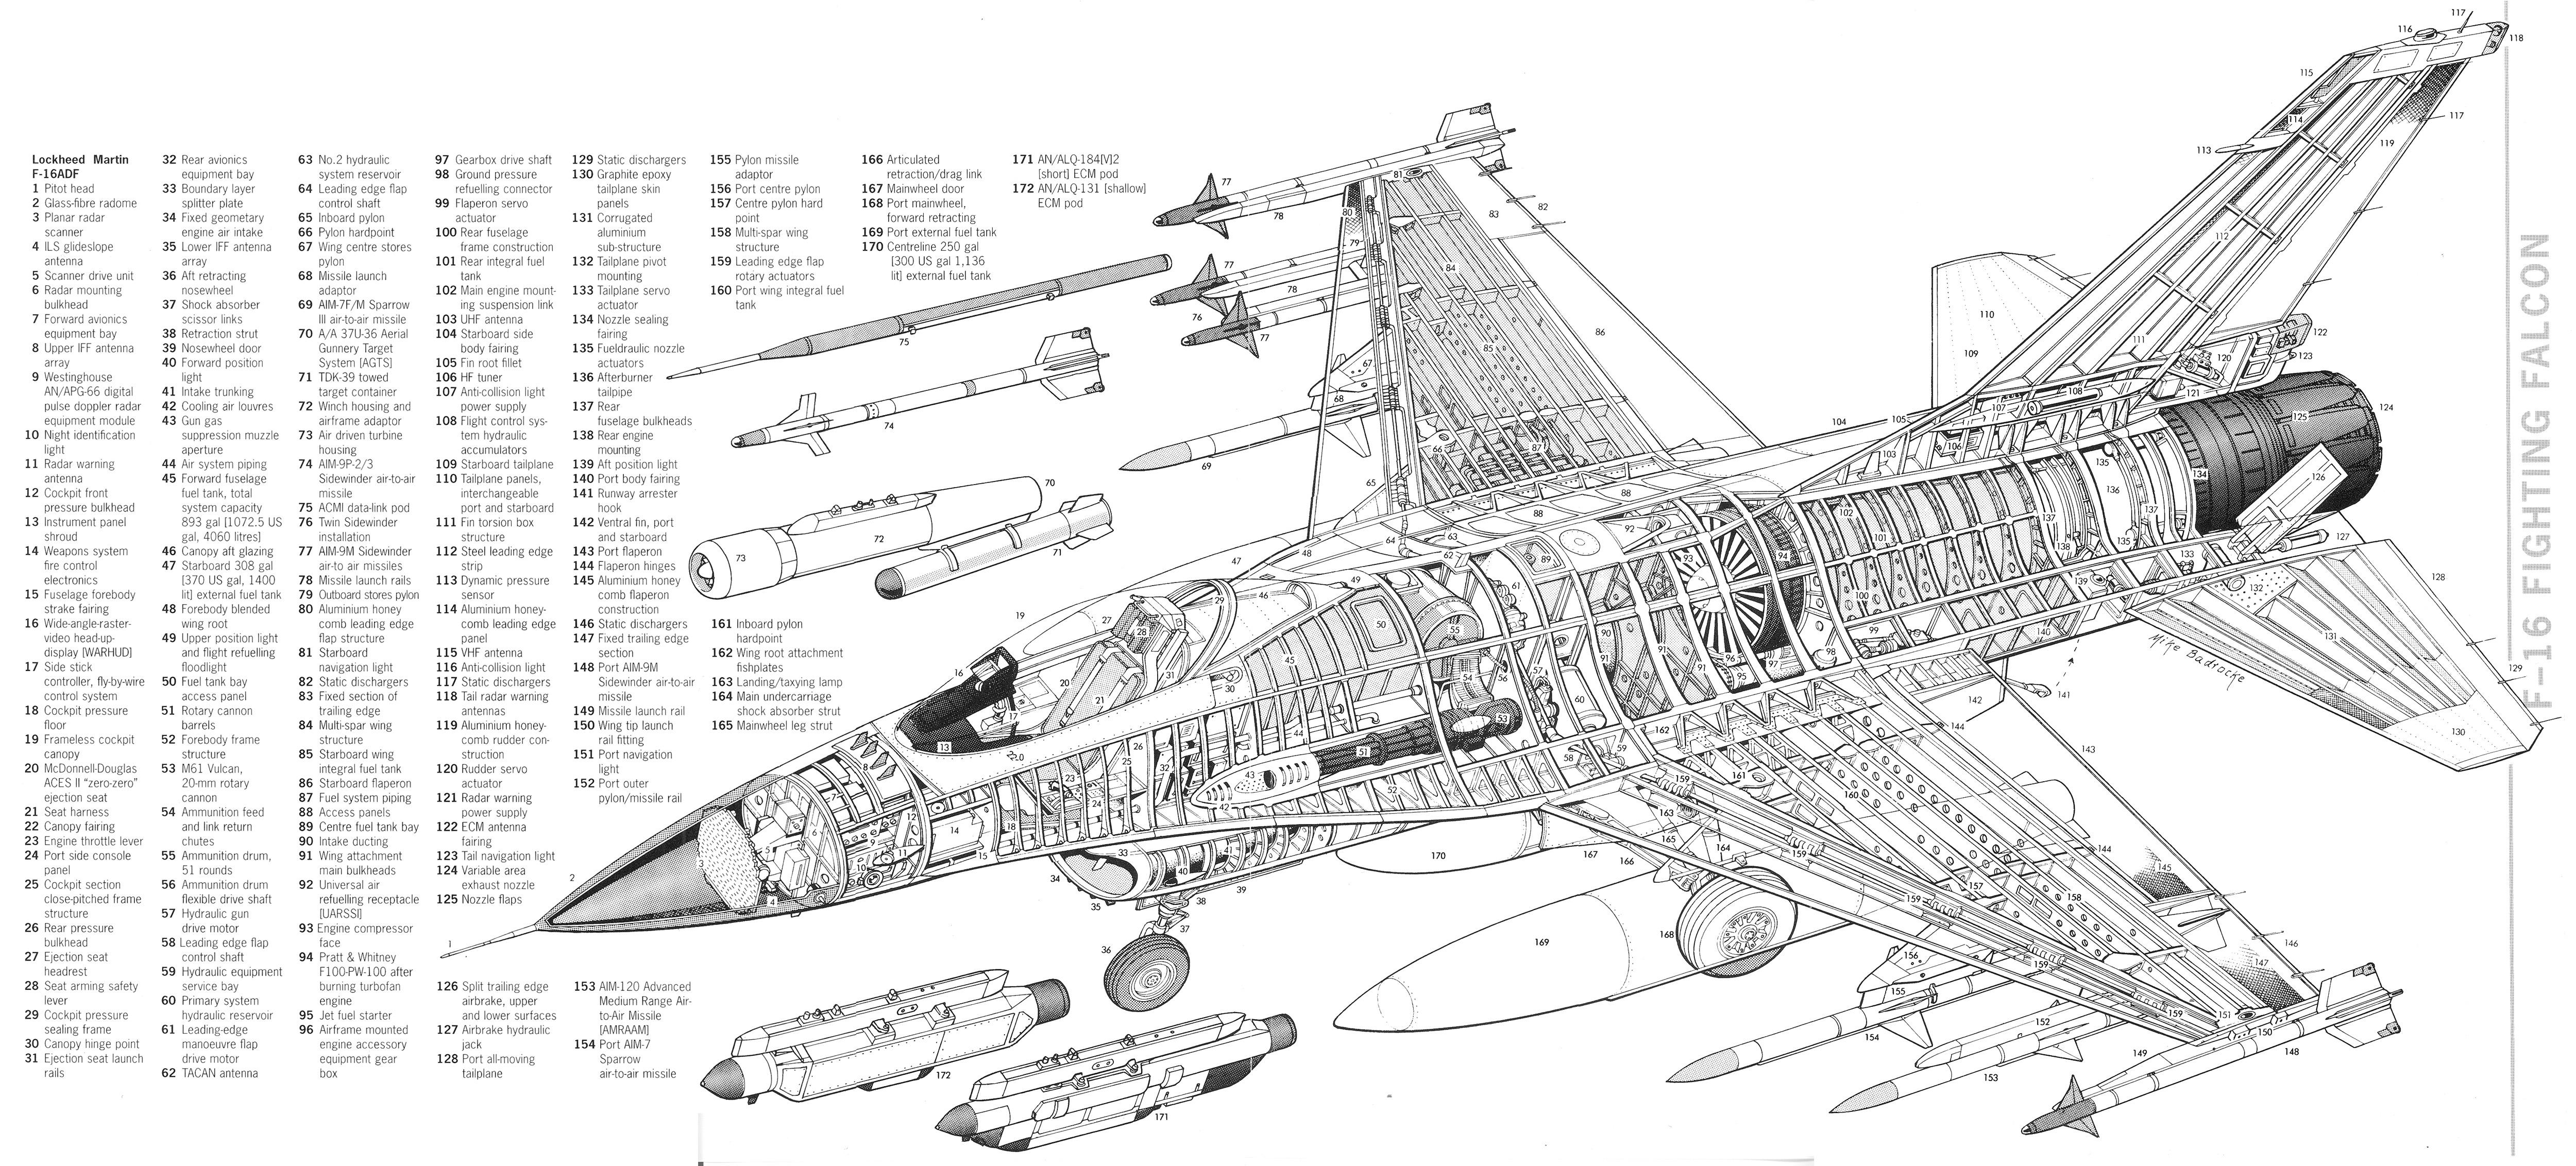 Lockheed Martin F 16 Fighting Falcon Cutaway Spaccato